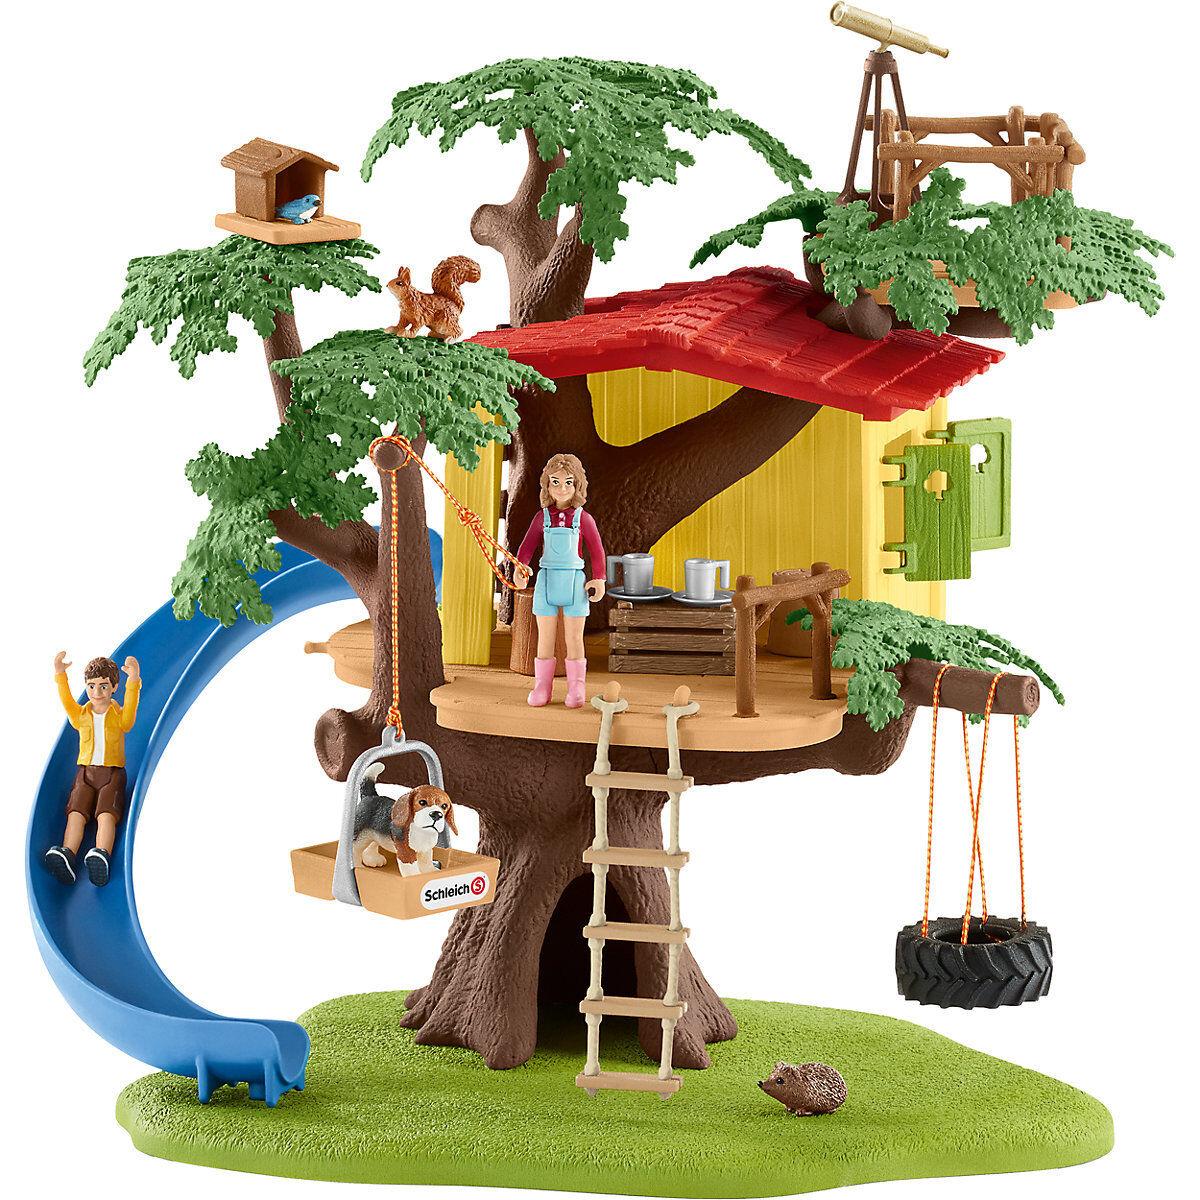 Schleich Farm World 42408 - Abenteuer Baumhaus con Molti Accessori Nuovo & Ovp